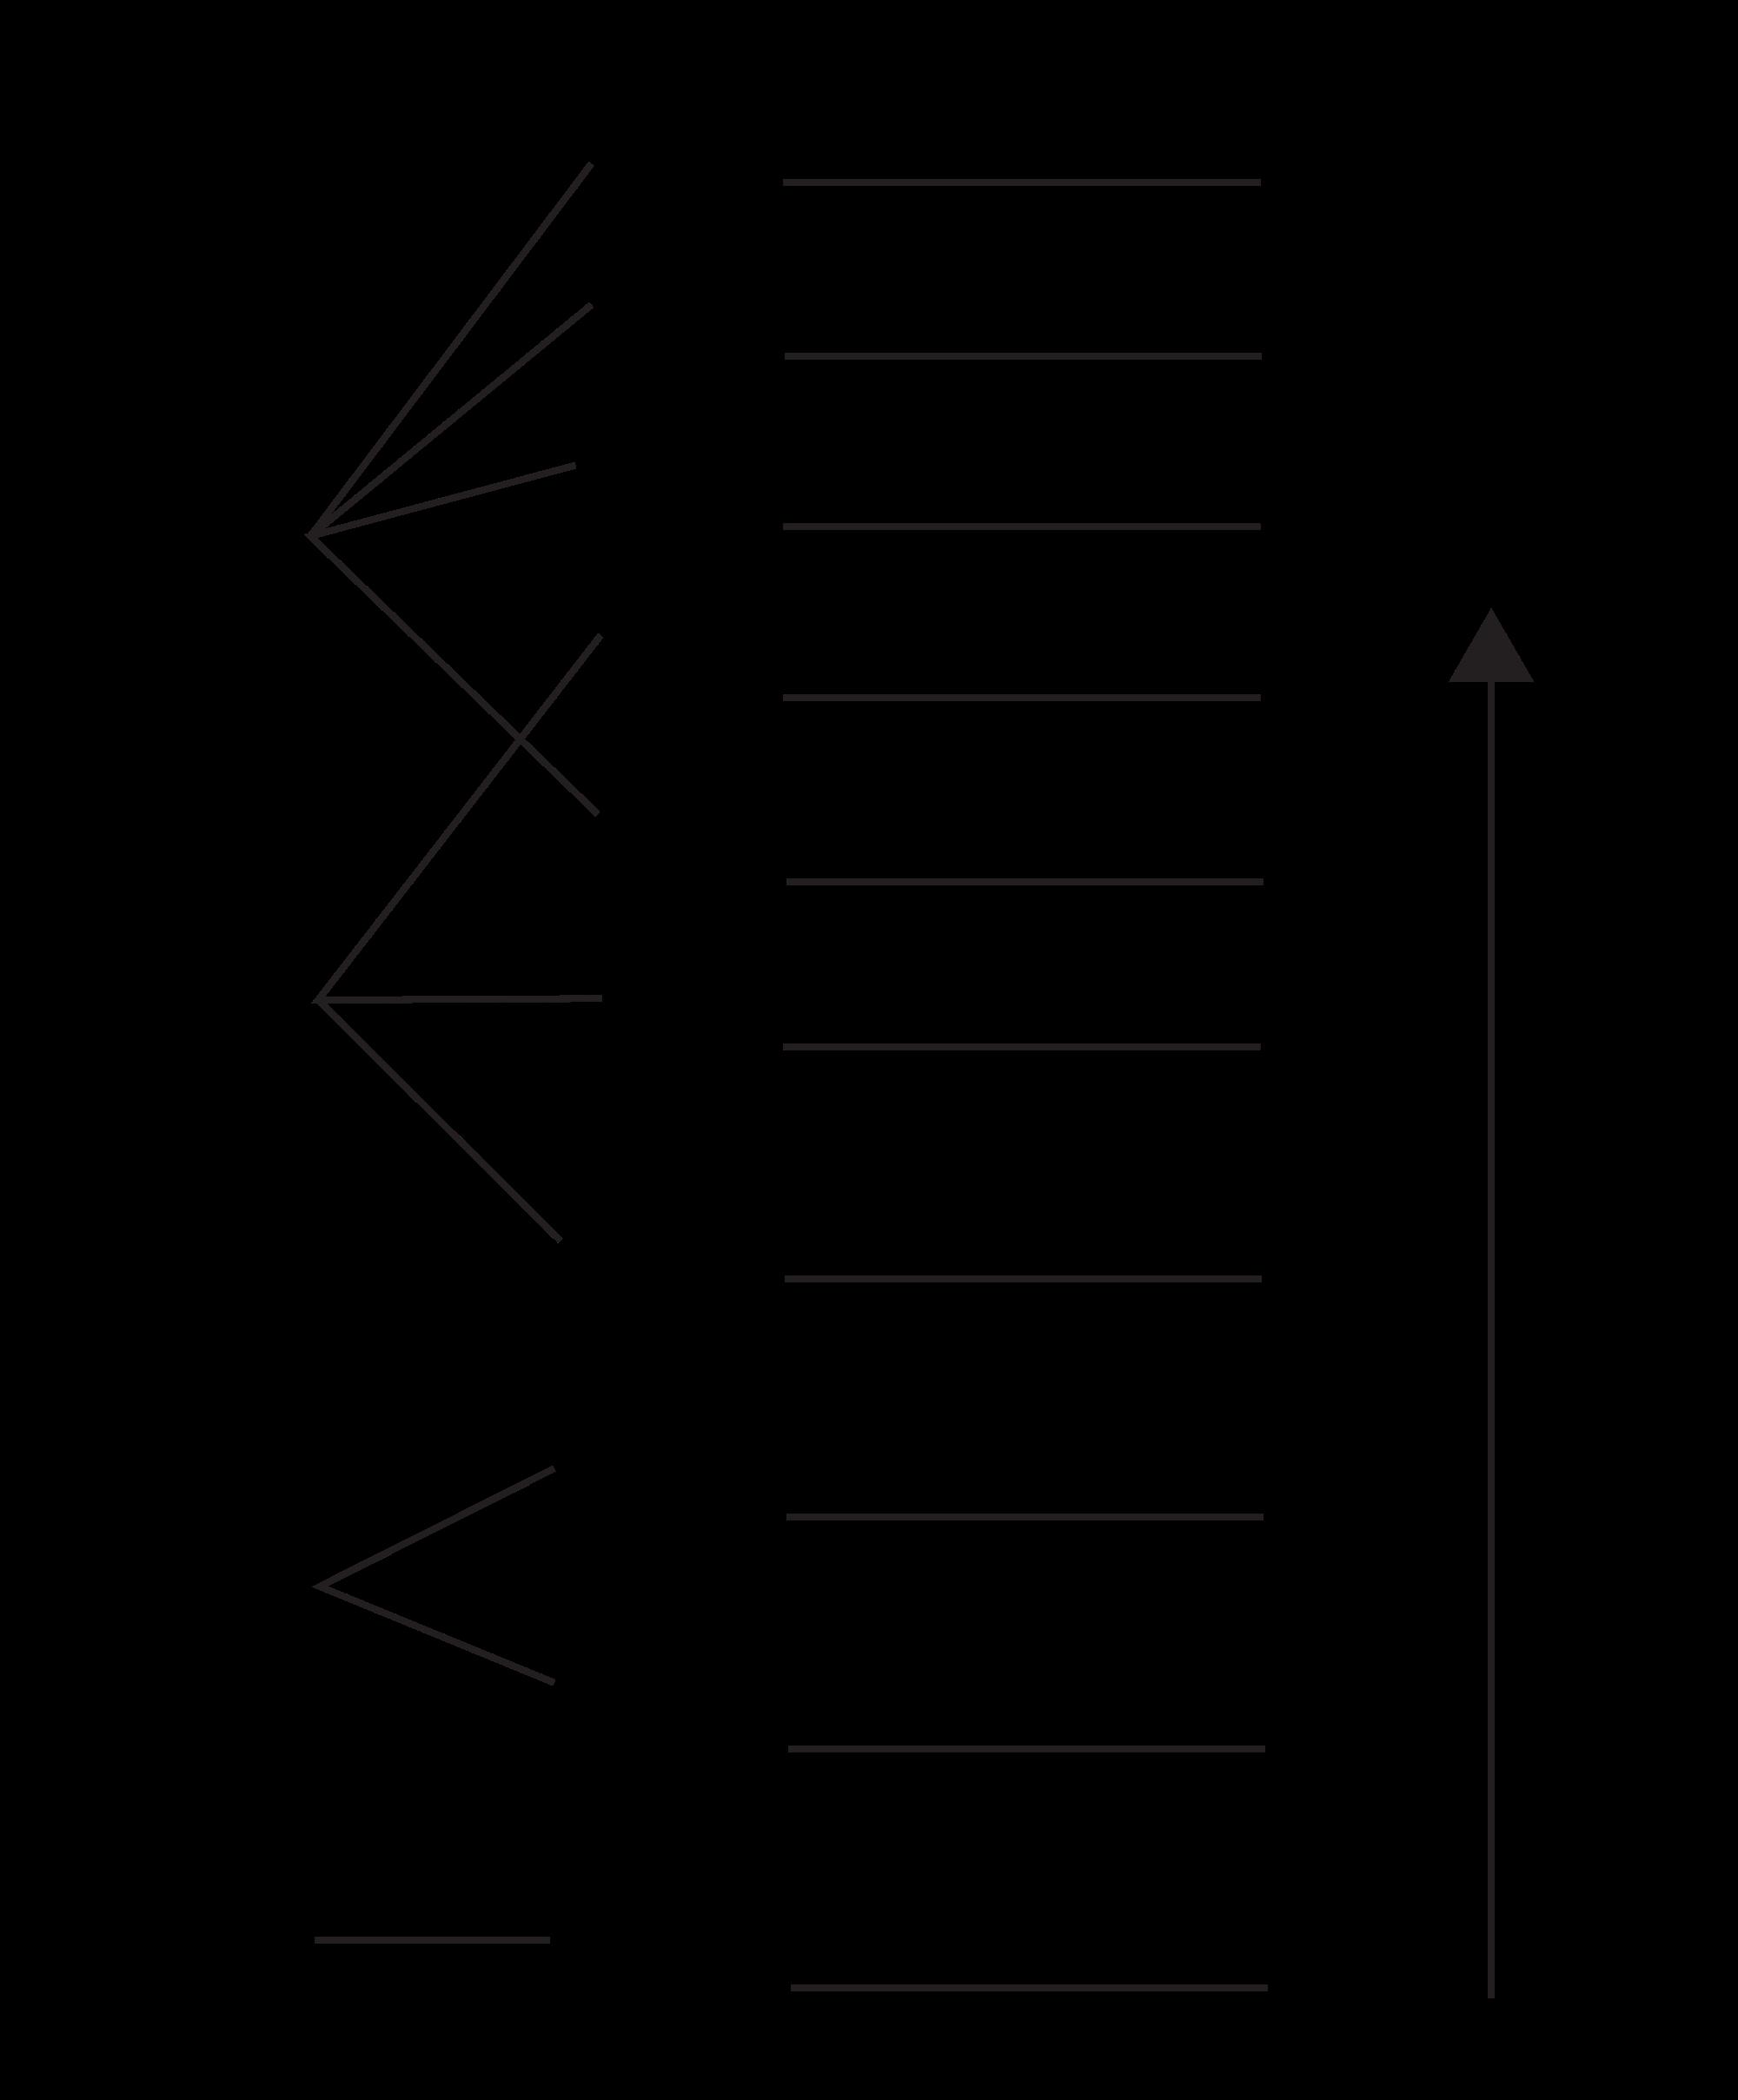 Energy Level Diagram Fileenergy Level Diagram Frsvg Wikimedia Commons